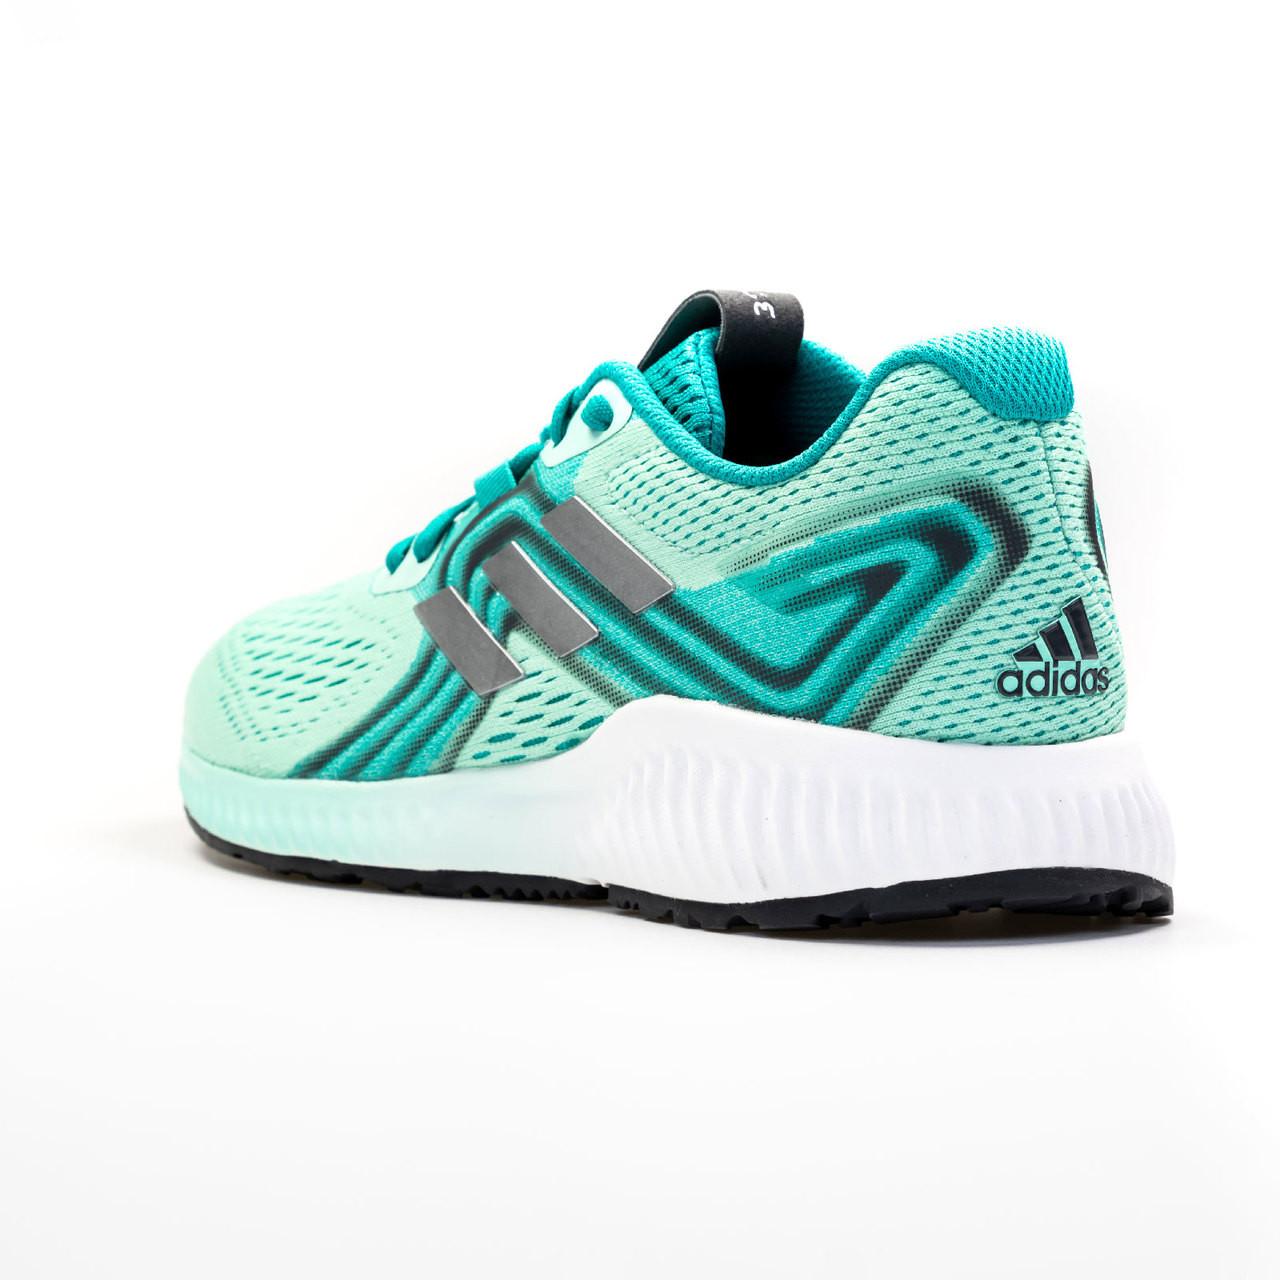 new style bf89b 696c5 ... Adidas Aerobounce Womens Sneakers AQ0538 - Aqua, Silver ...